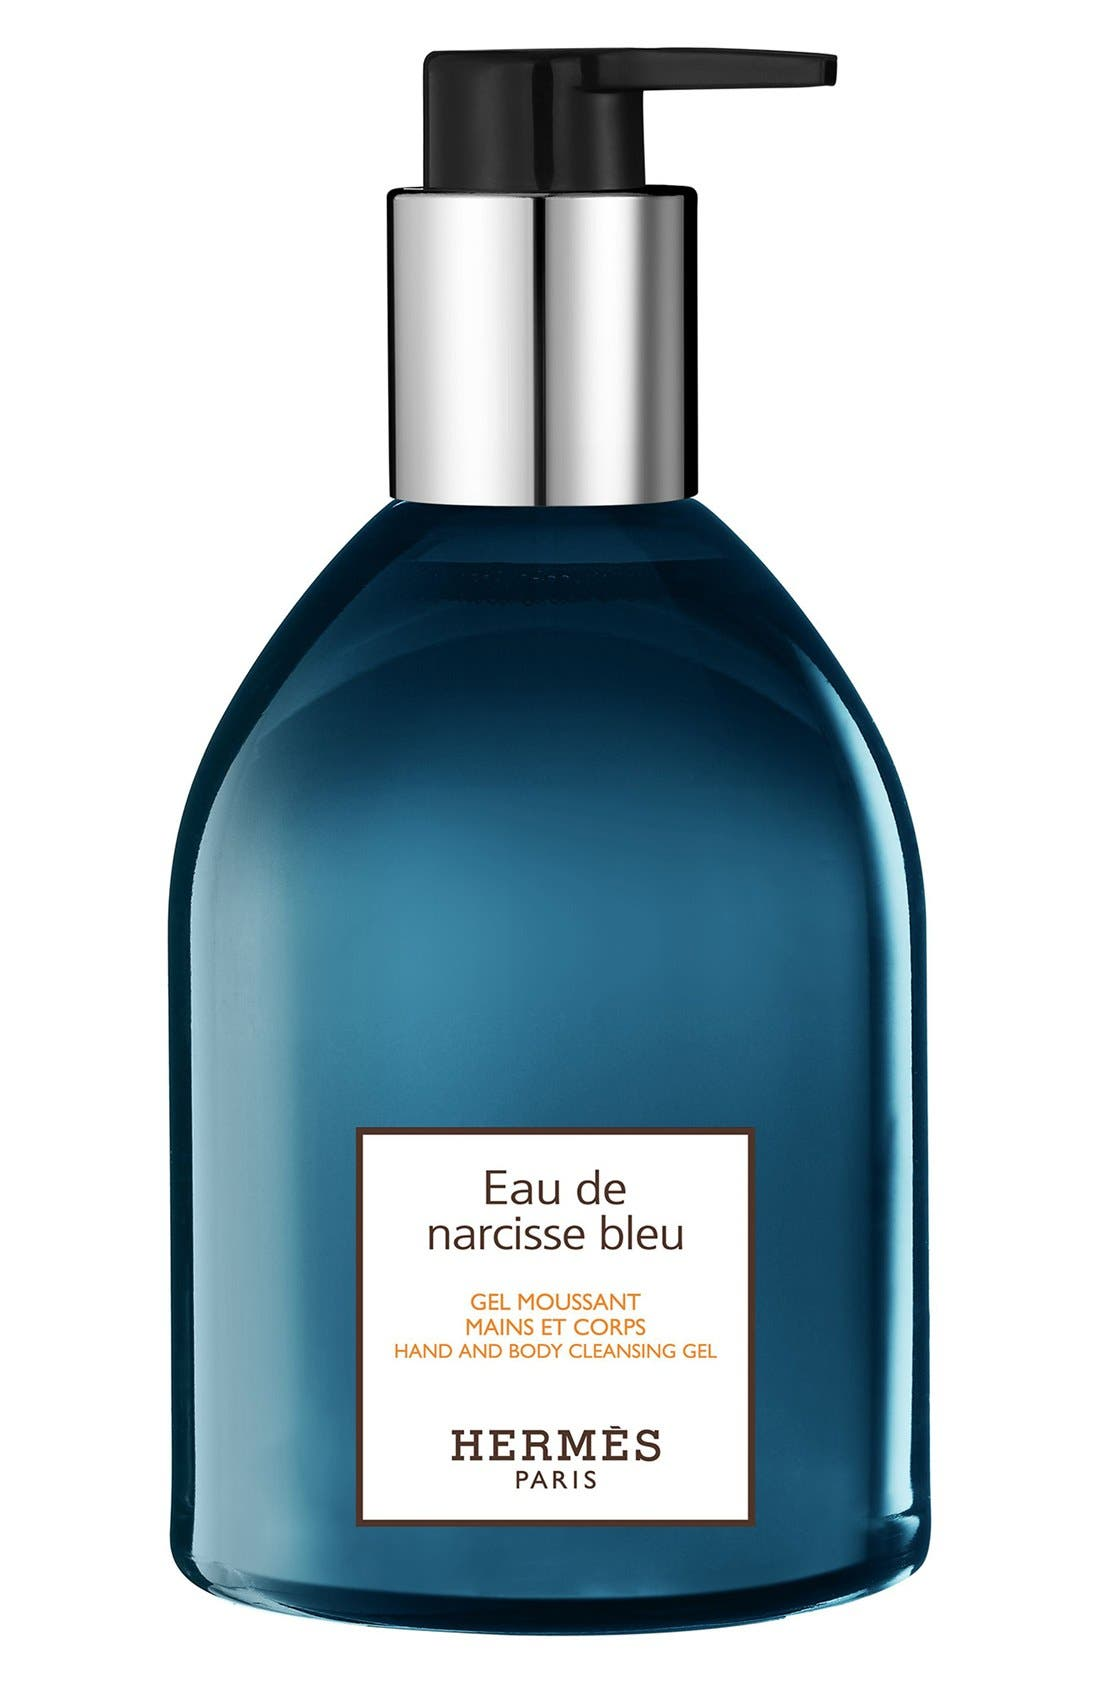 Hermès Eau de Narcisse Bleu - Hand and body cleansing gel